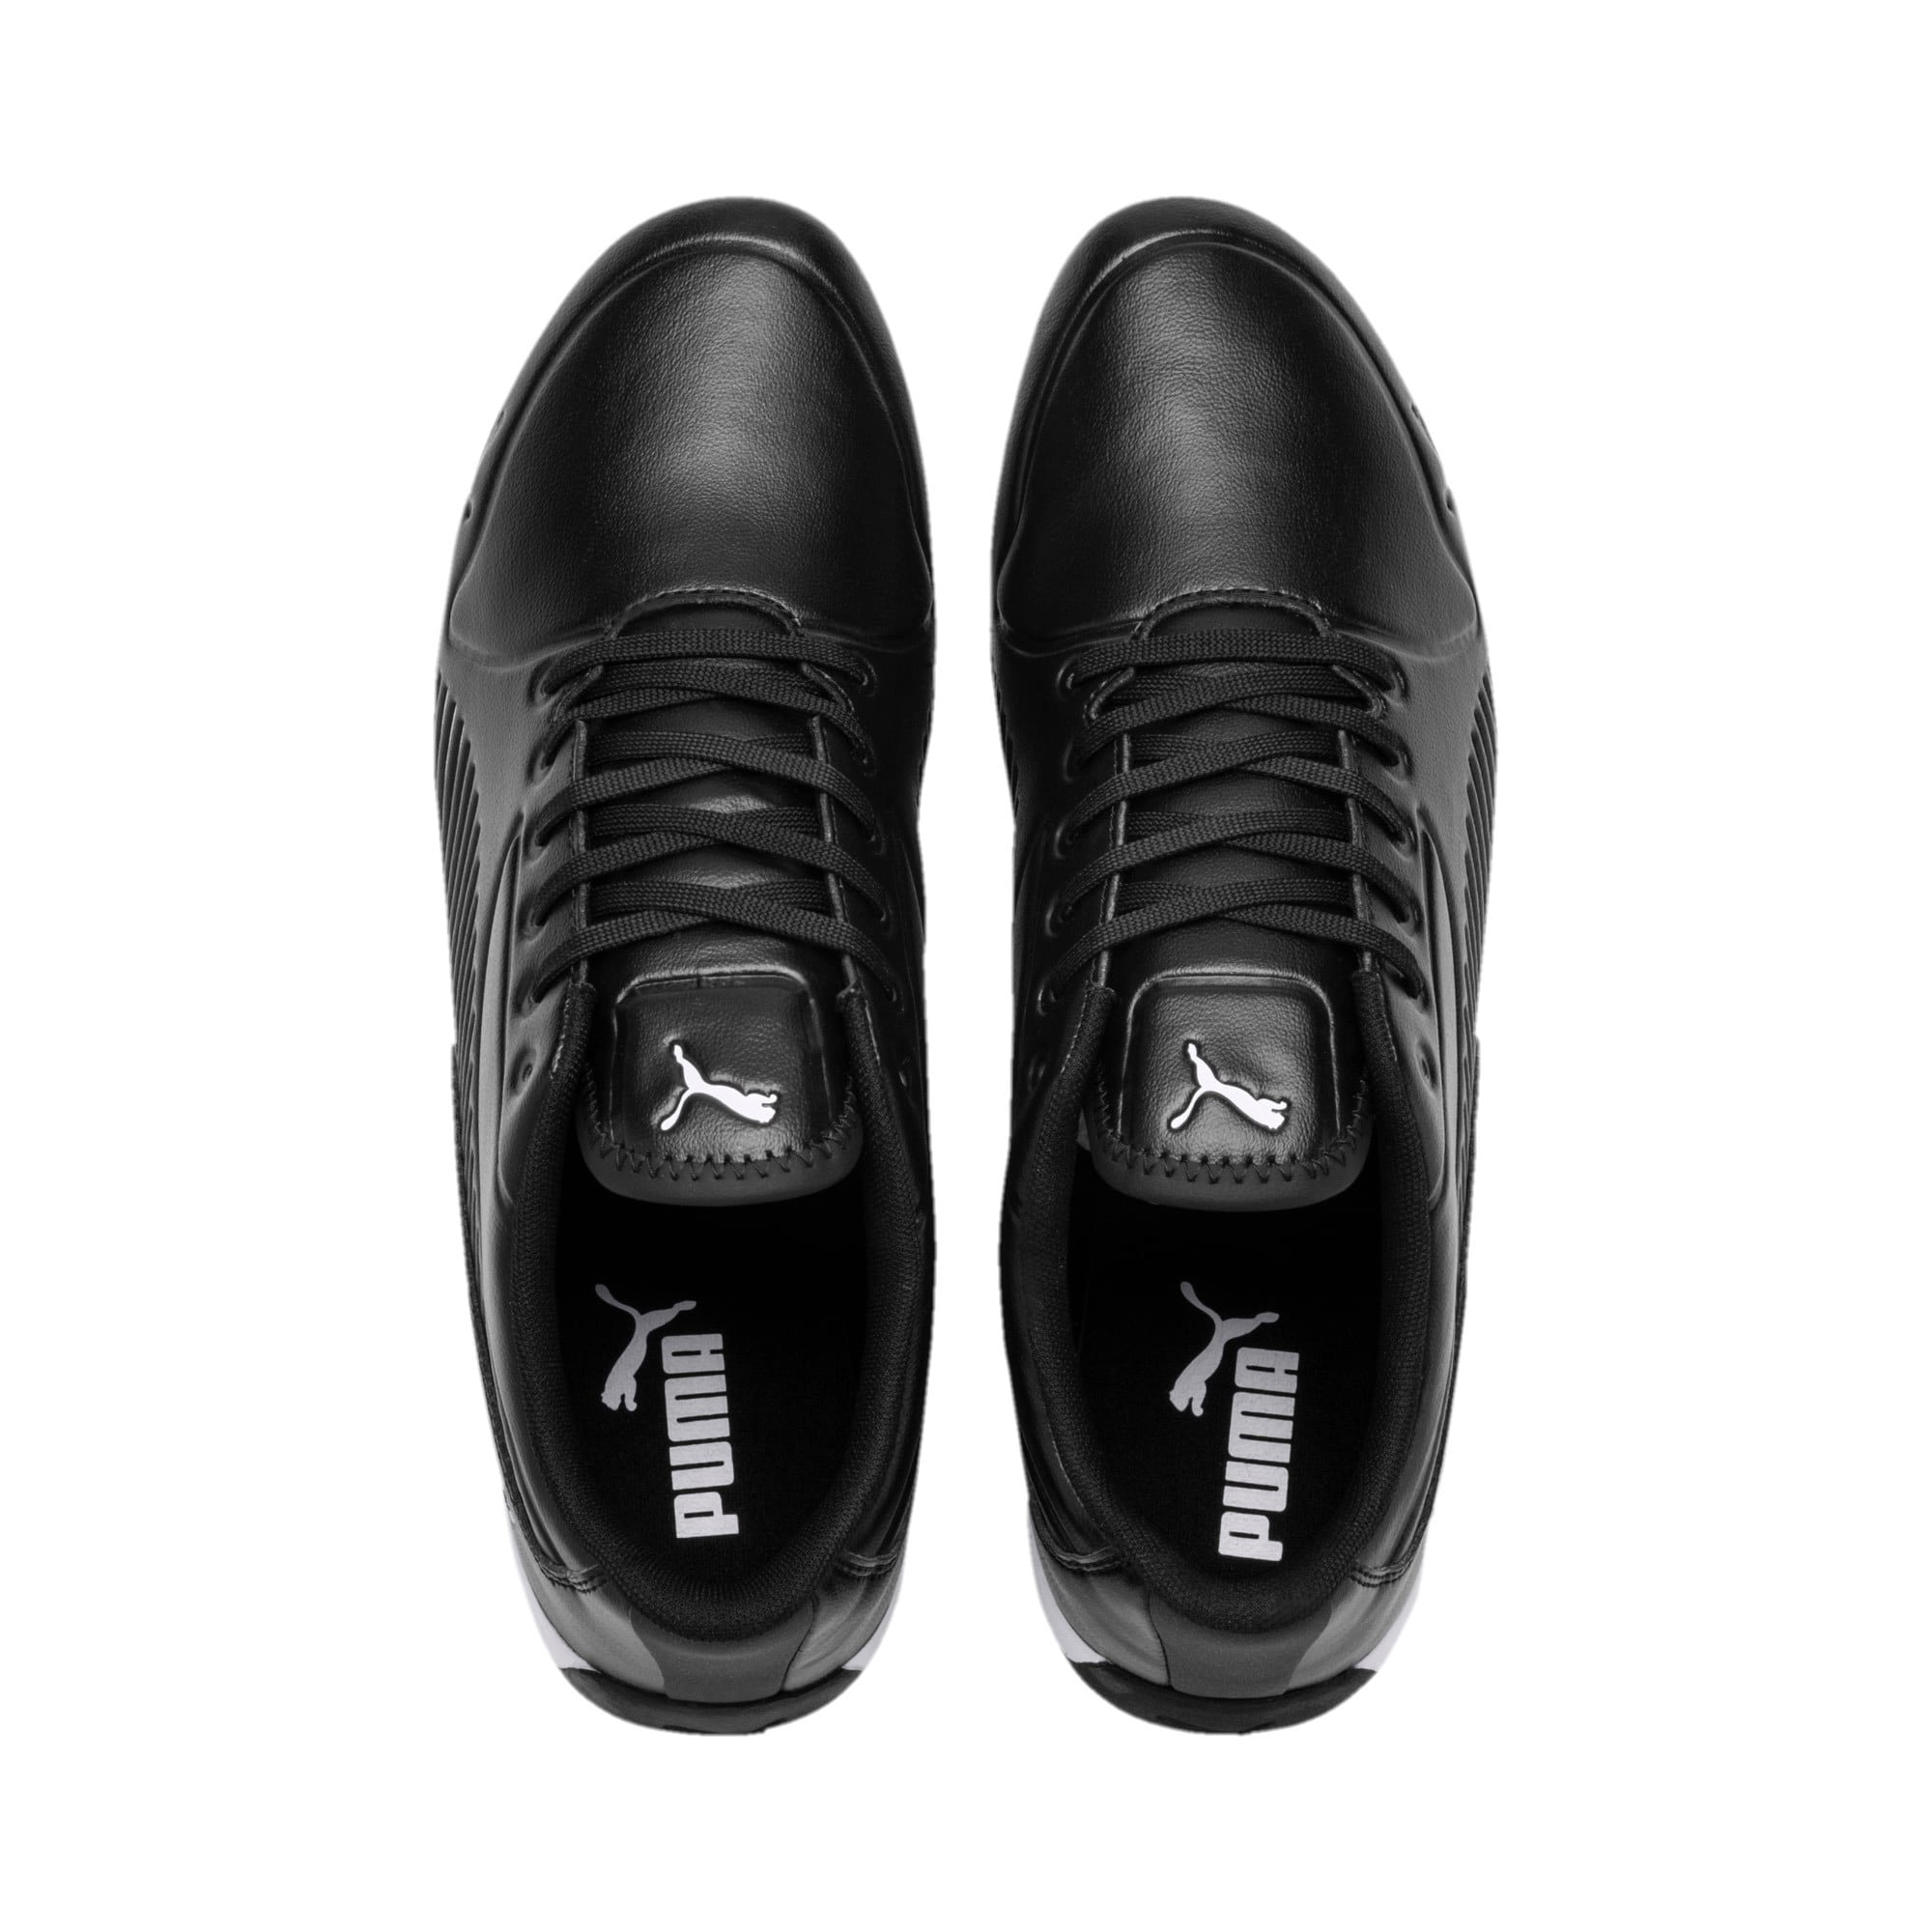 Thumbnail 7 of Scuderia Ferrari Drift Cat 7S Ultra Men's Shoes, Puma Black-Puma White, medium